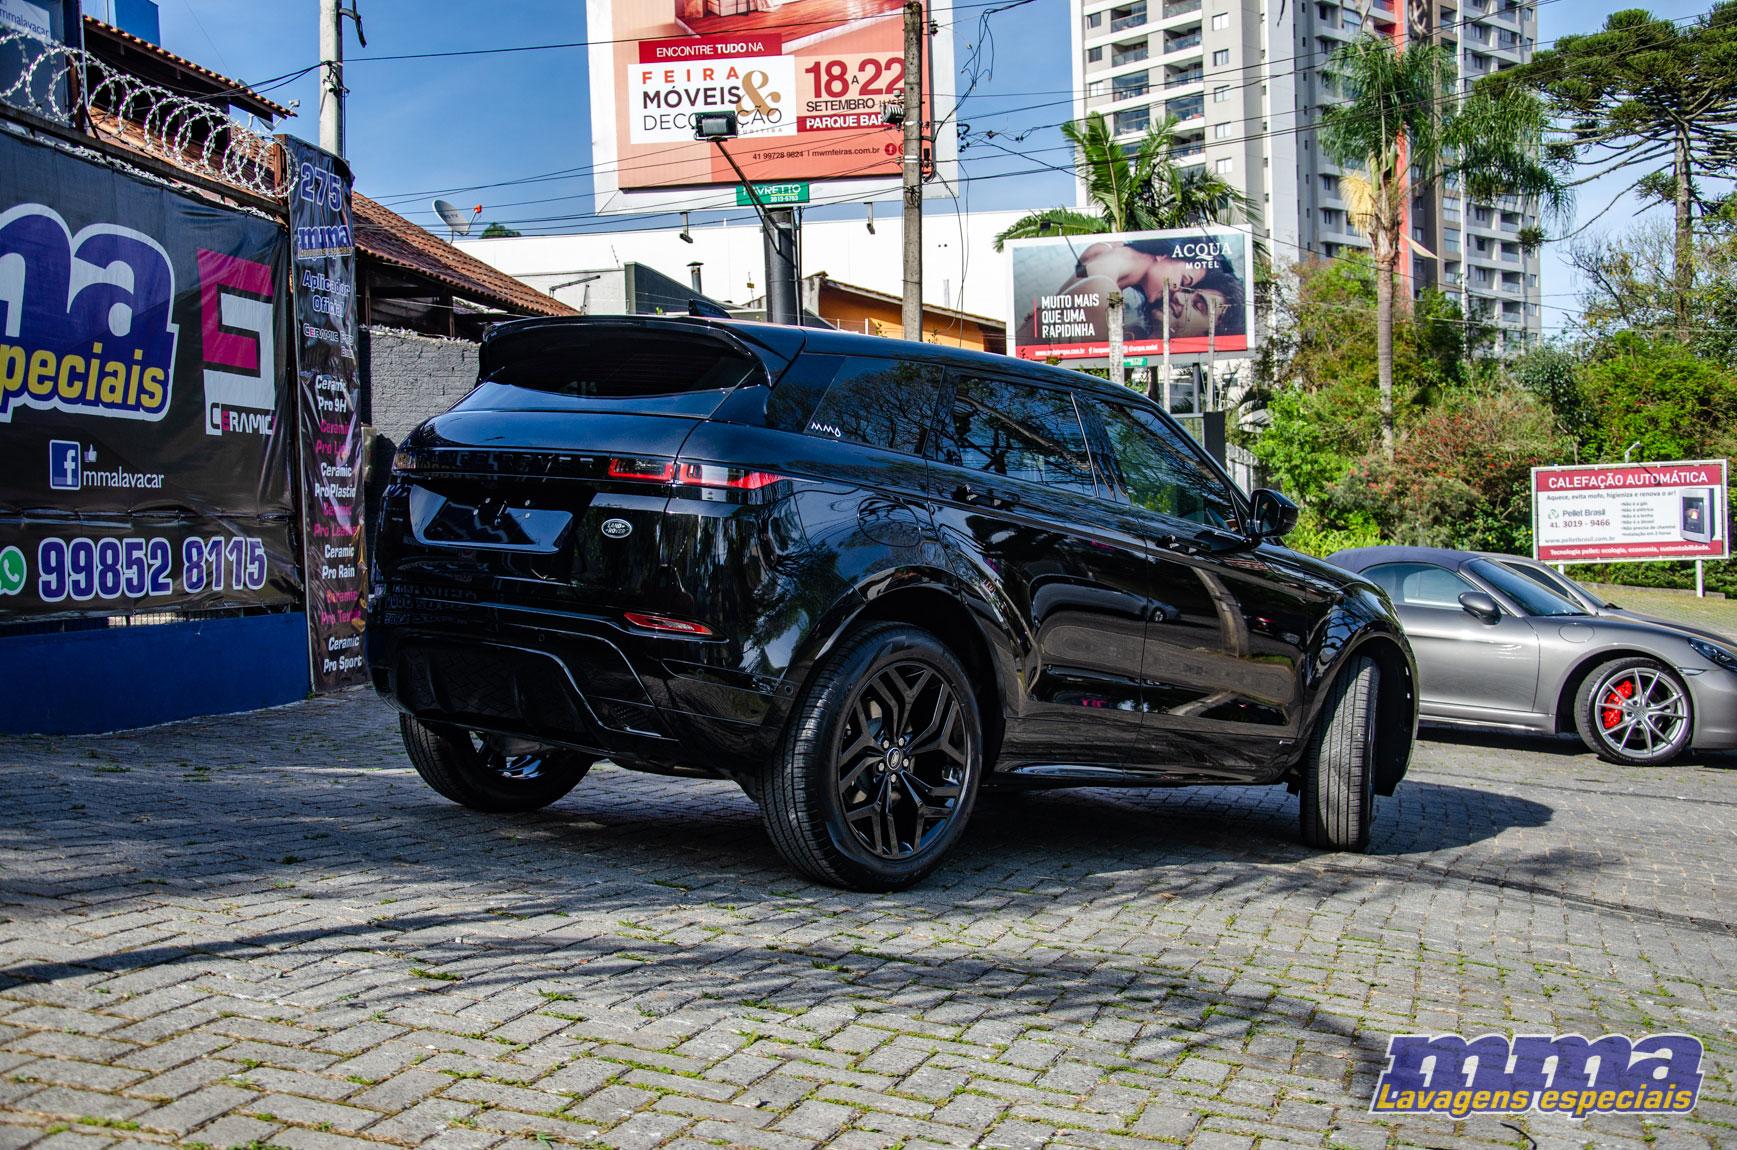 Range Rover Evoque <br> P300 HSE R-Dynamic